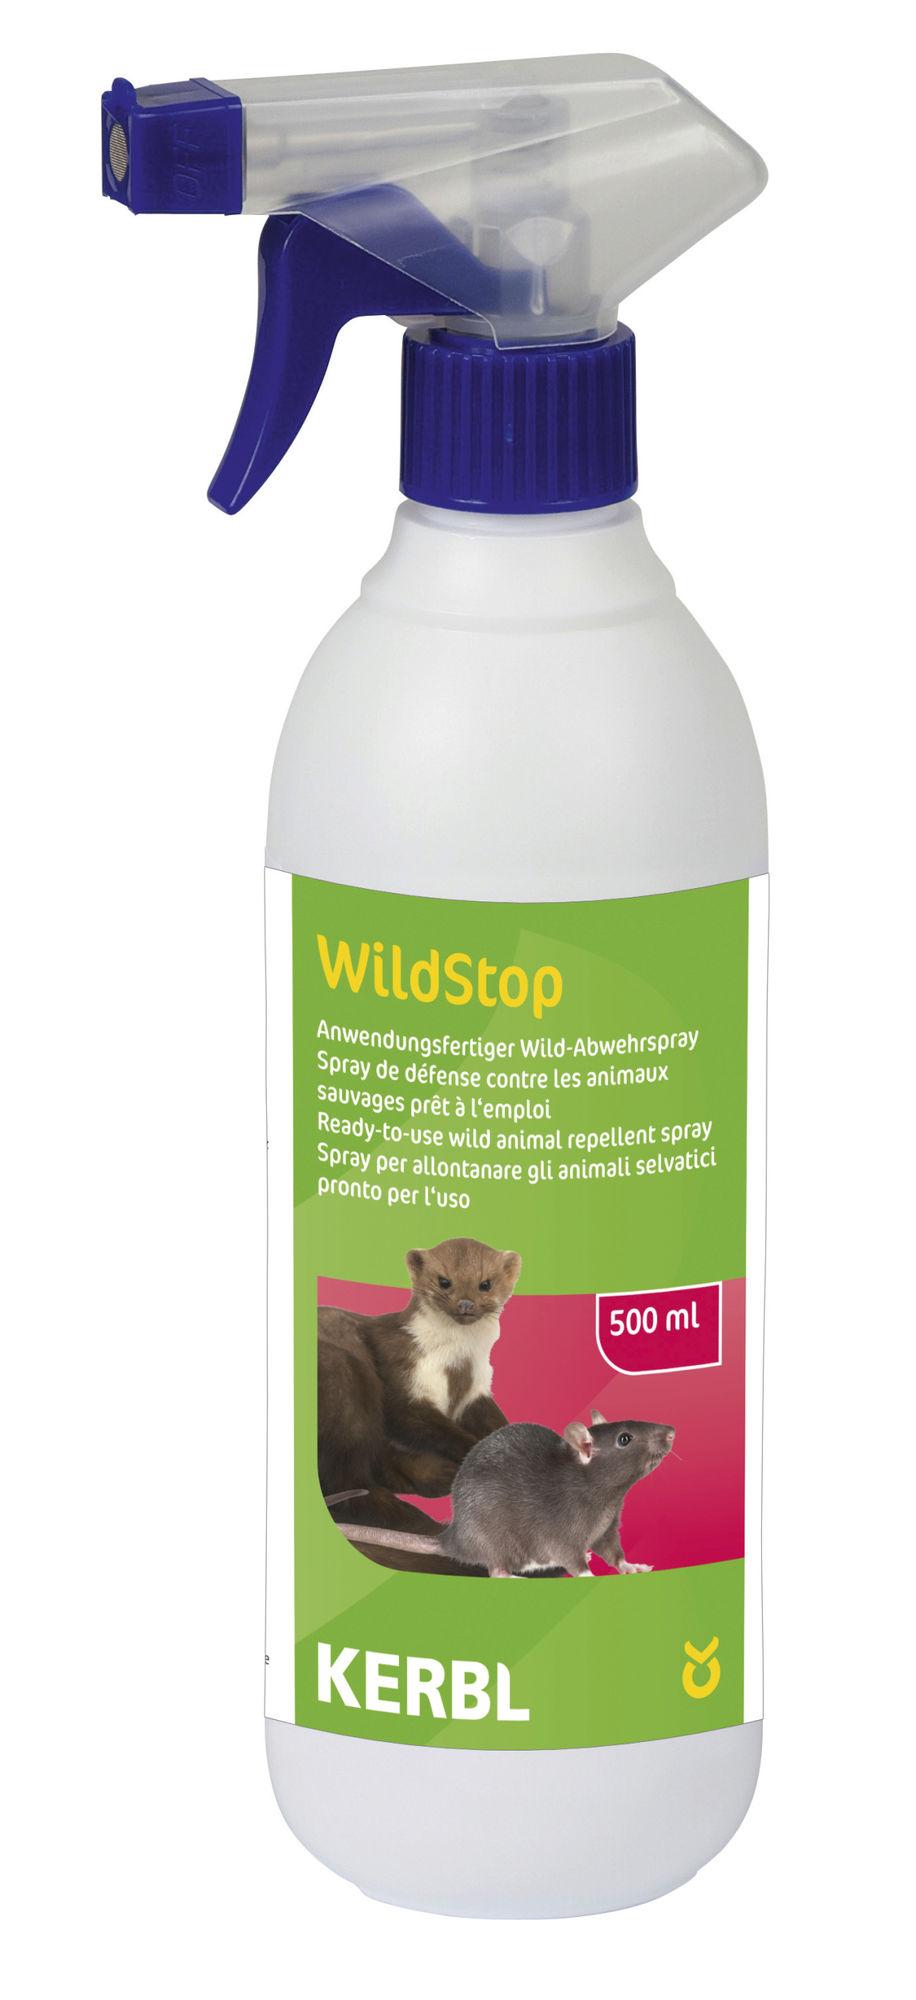 WildStop Spray 500ml anwendungsfertig